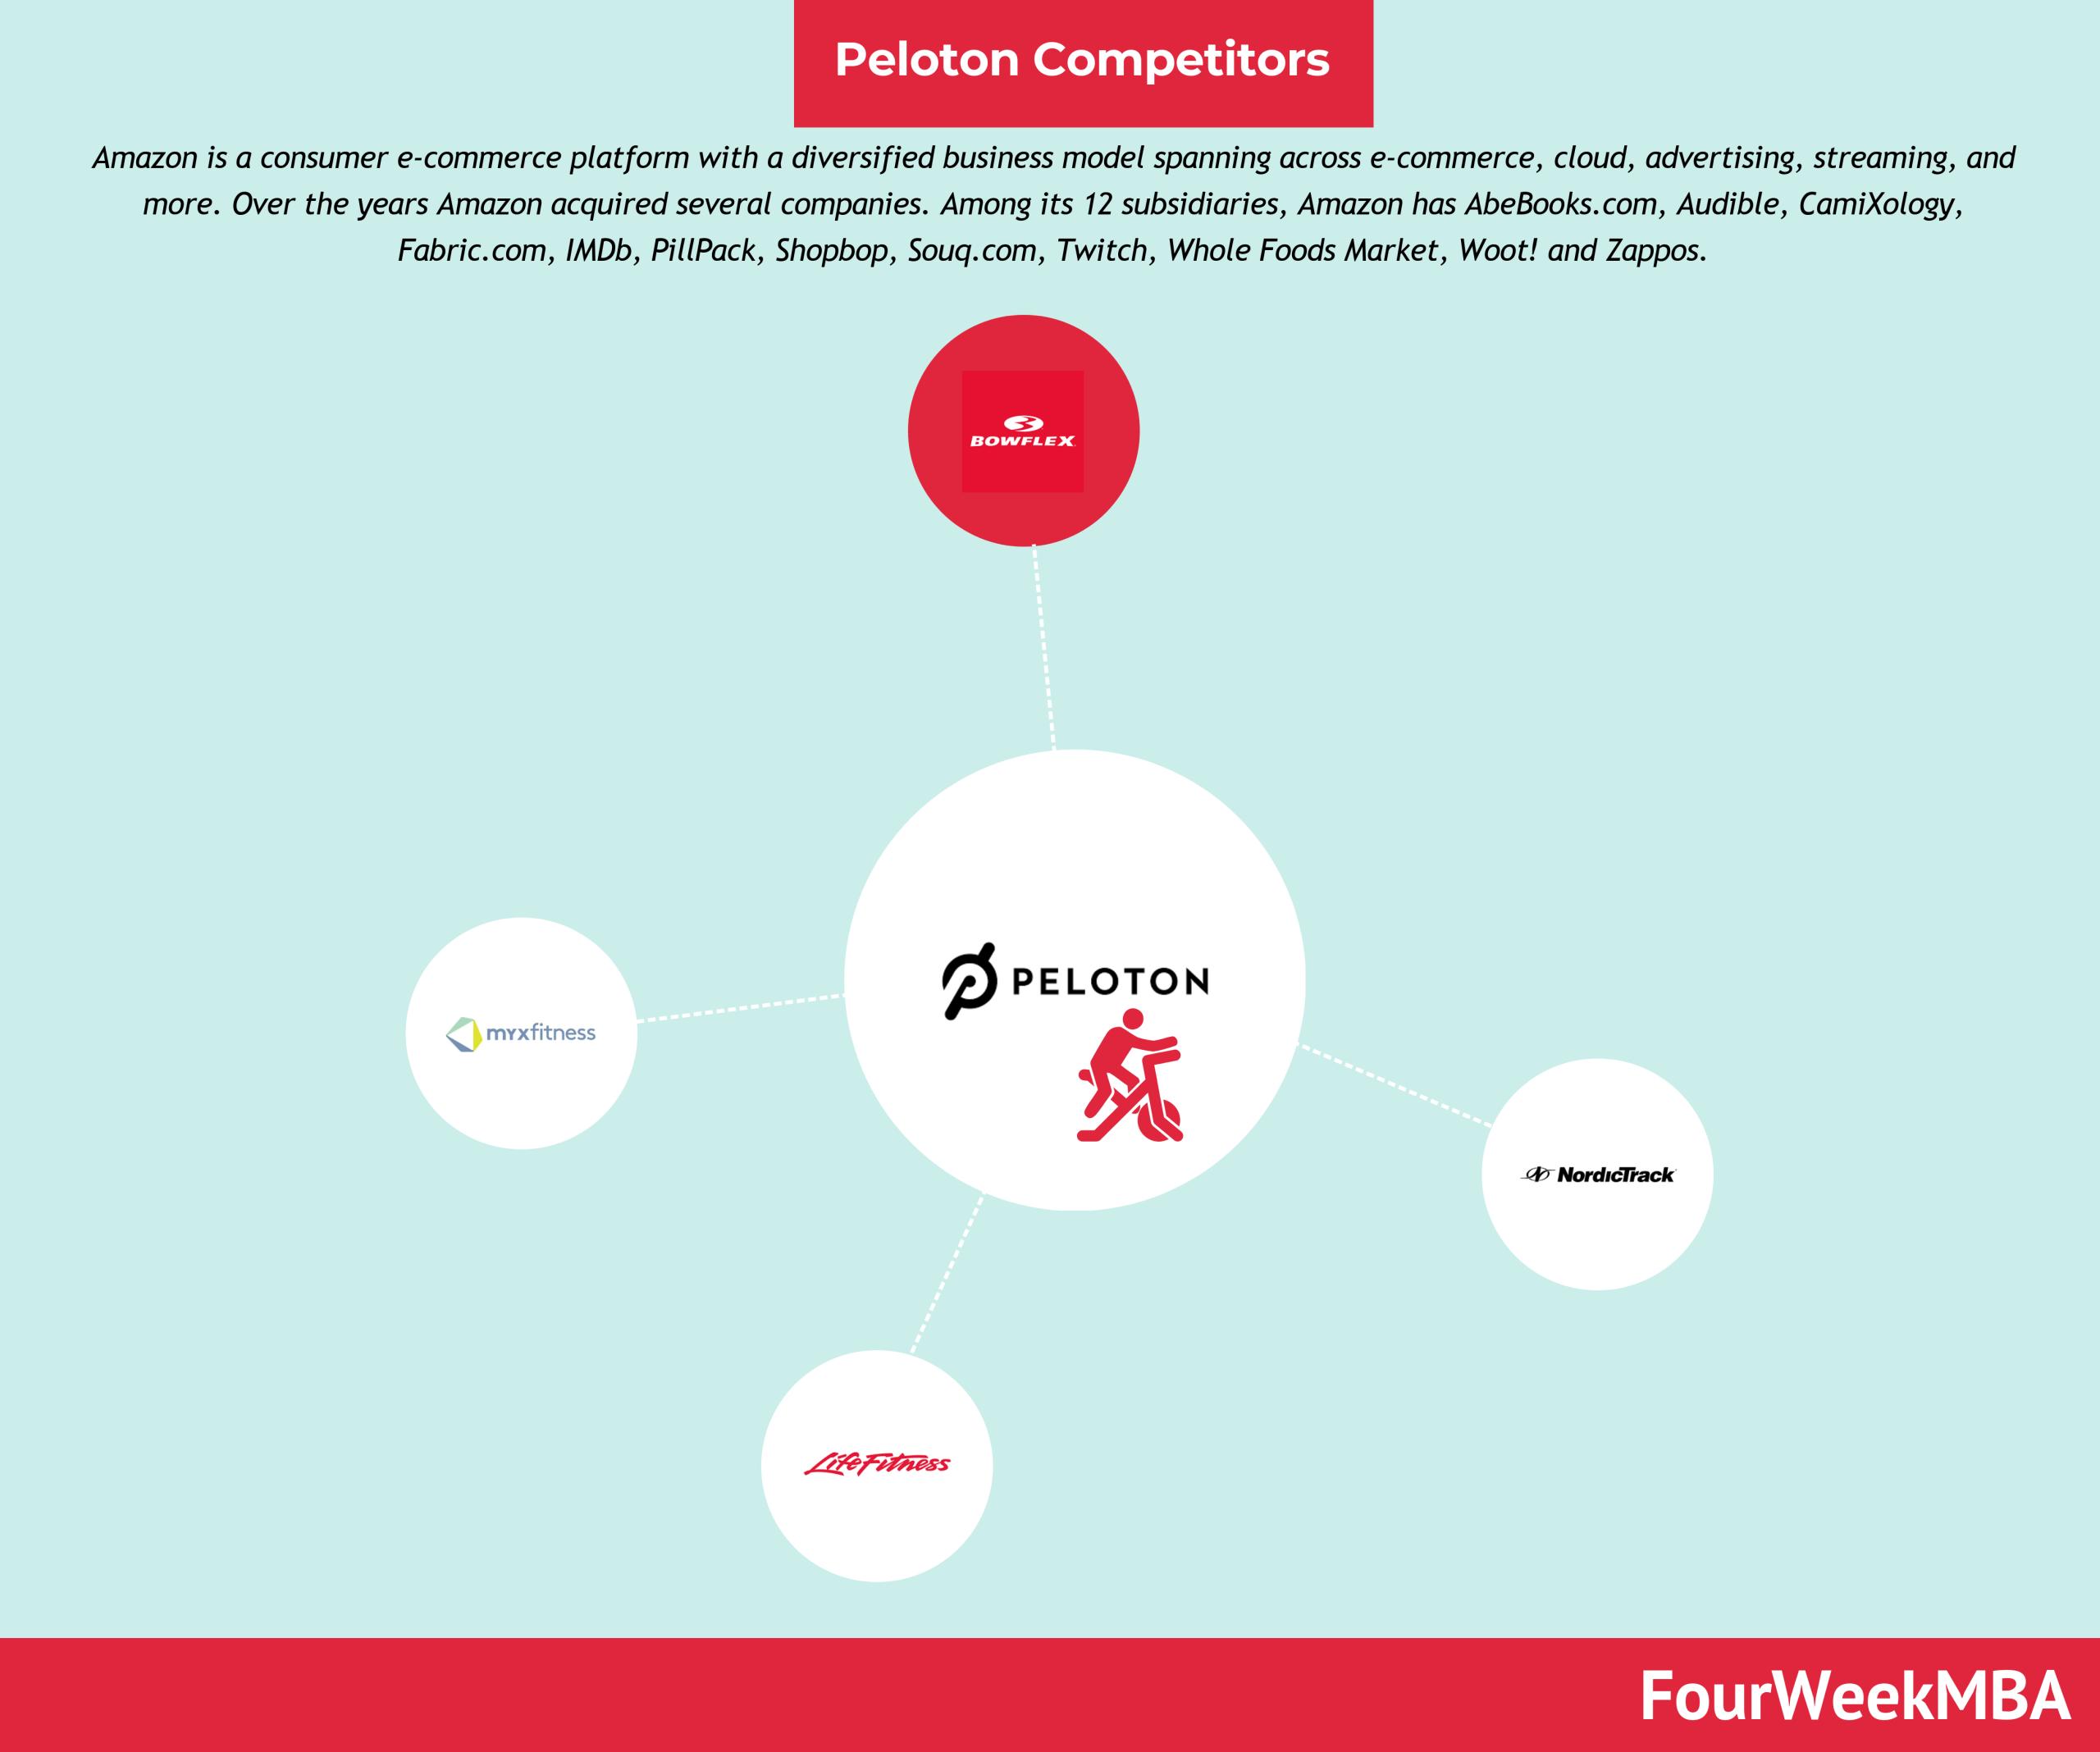 peloton-competitors